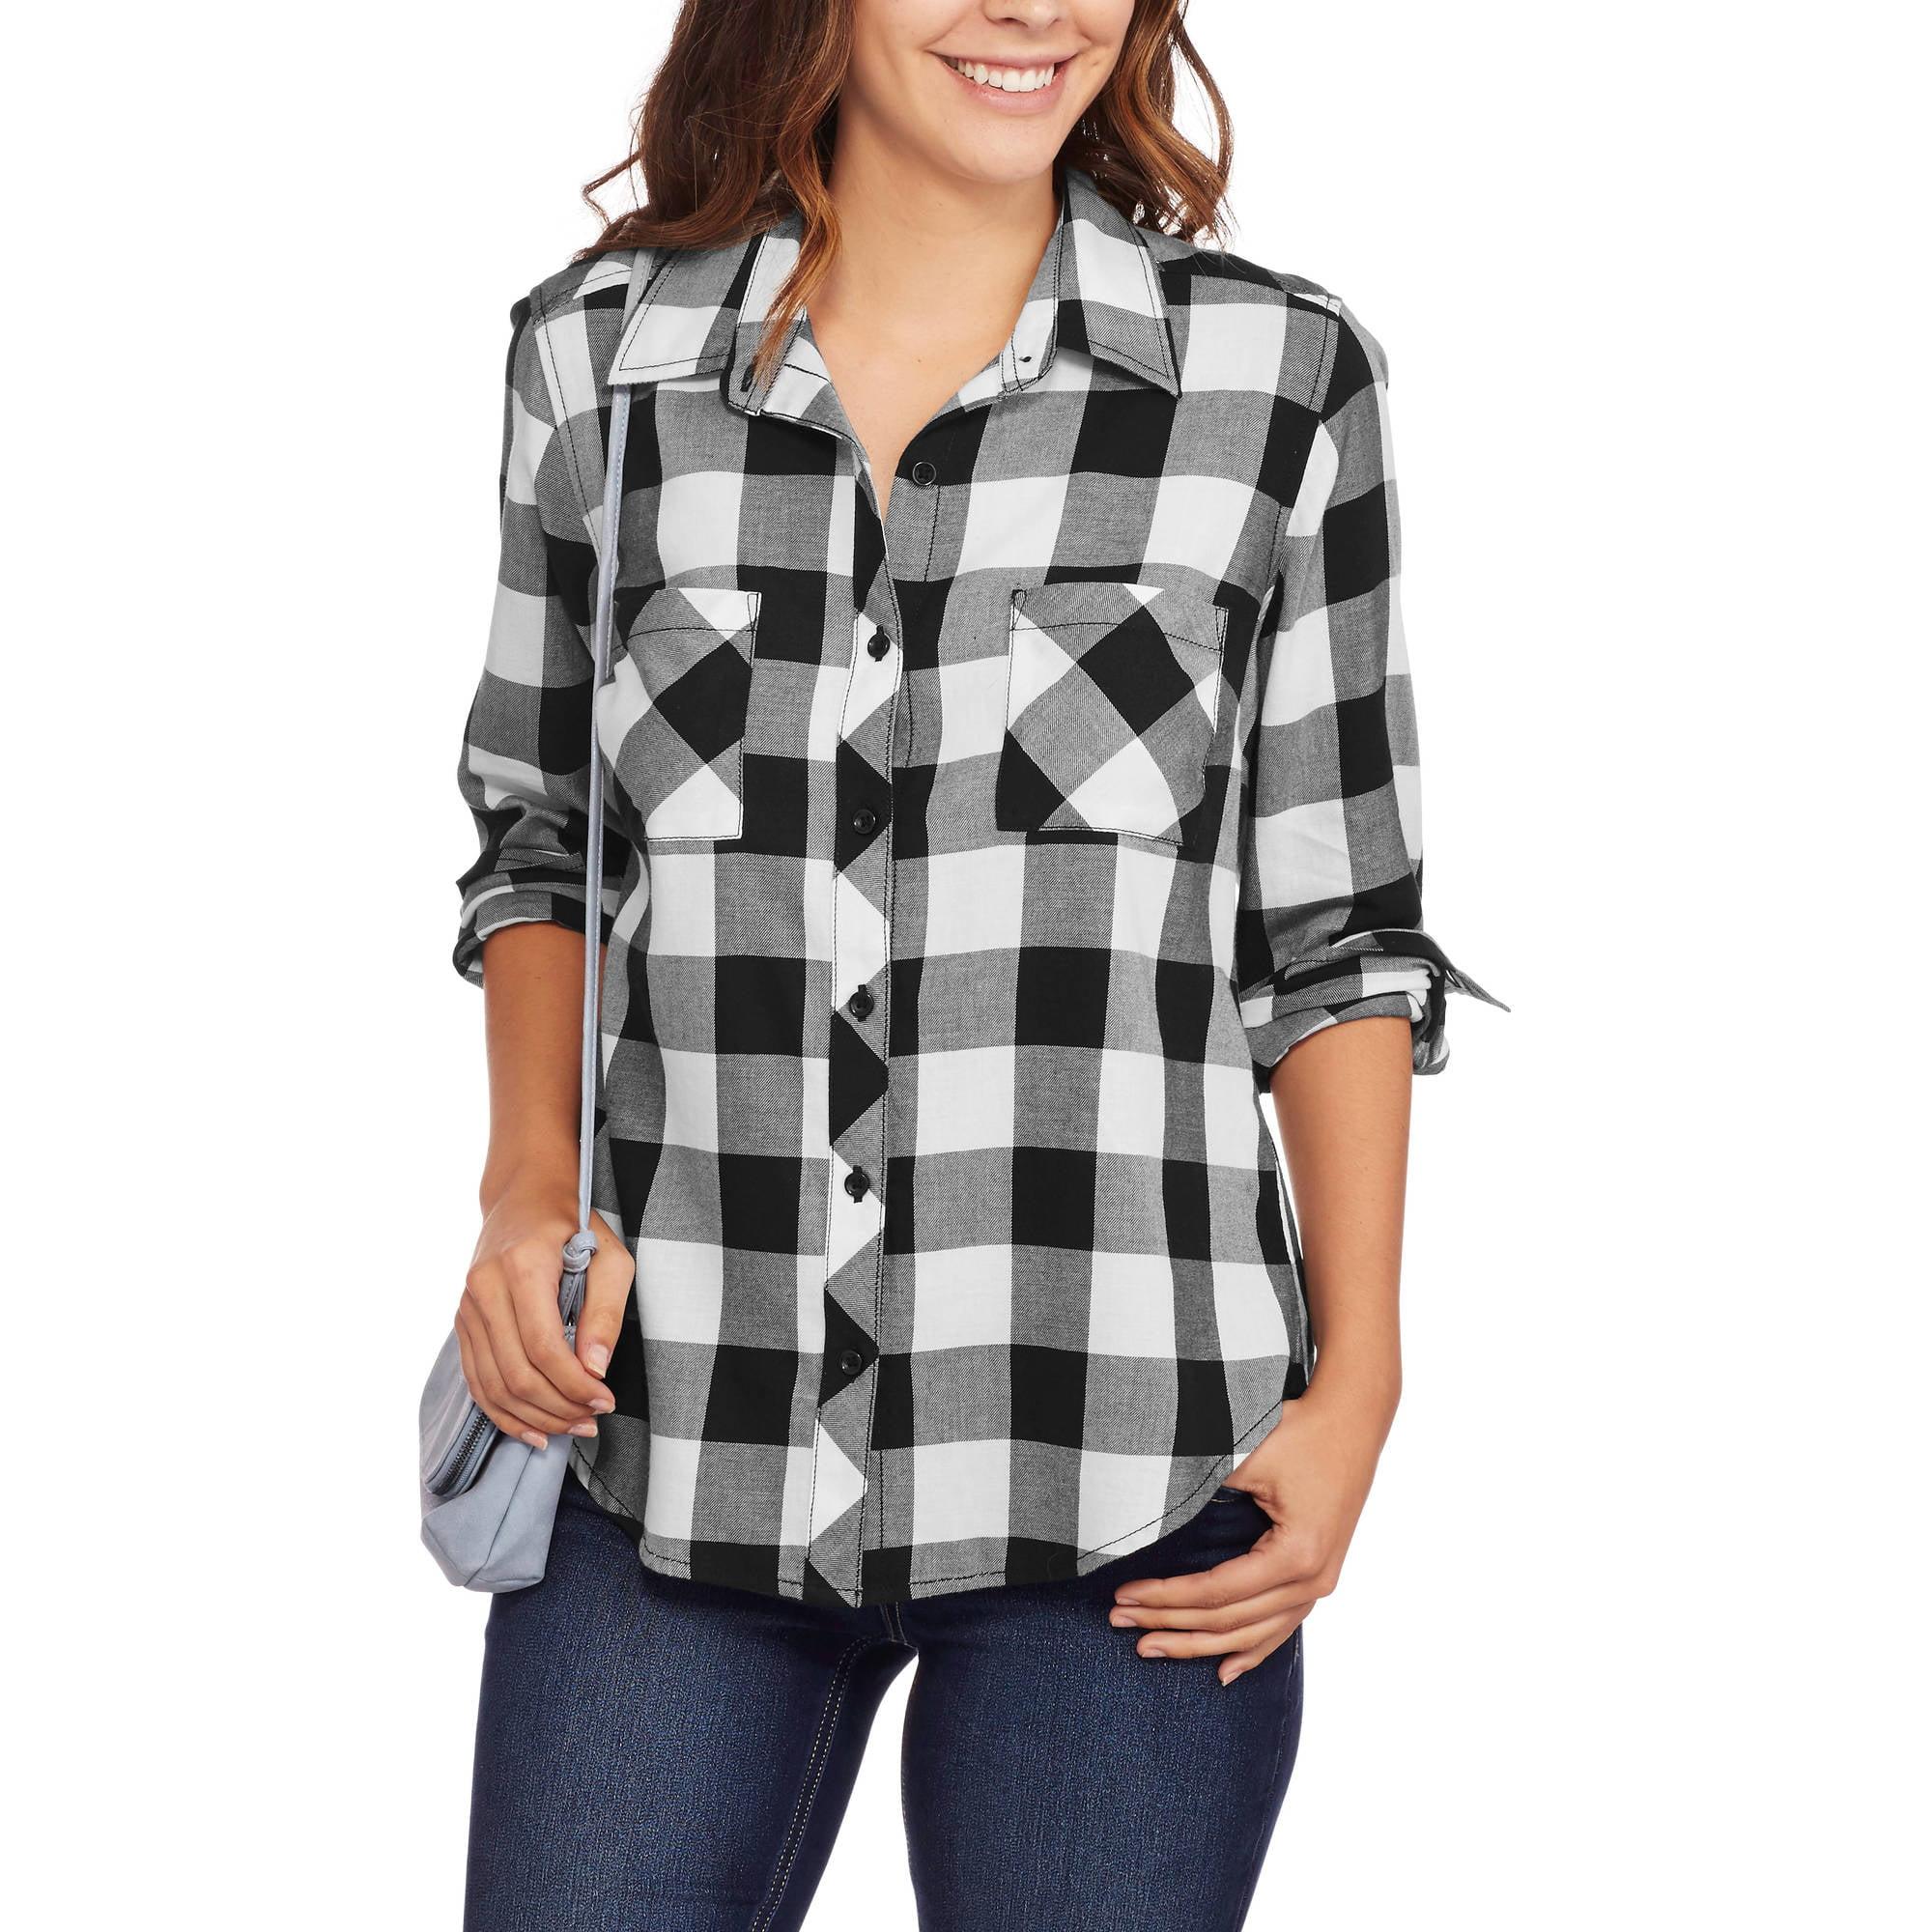 Sexy plaid shirts for women